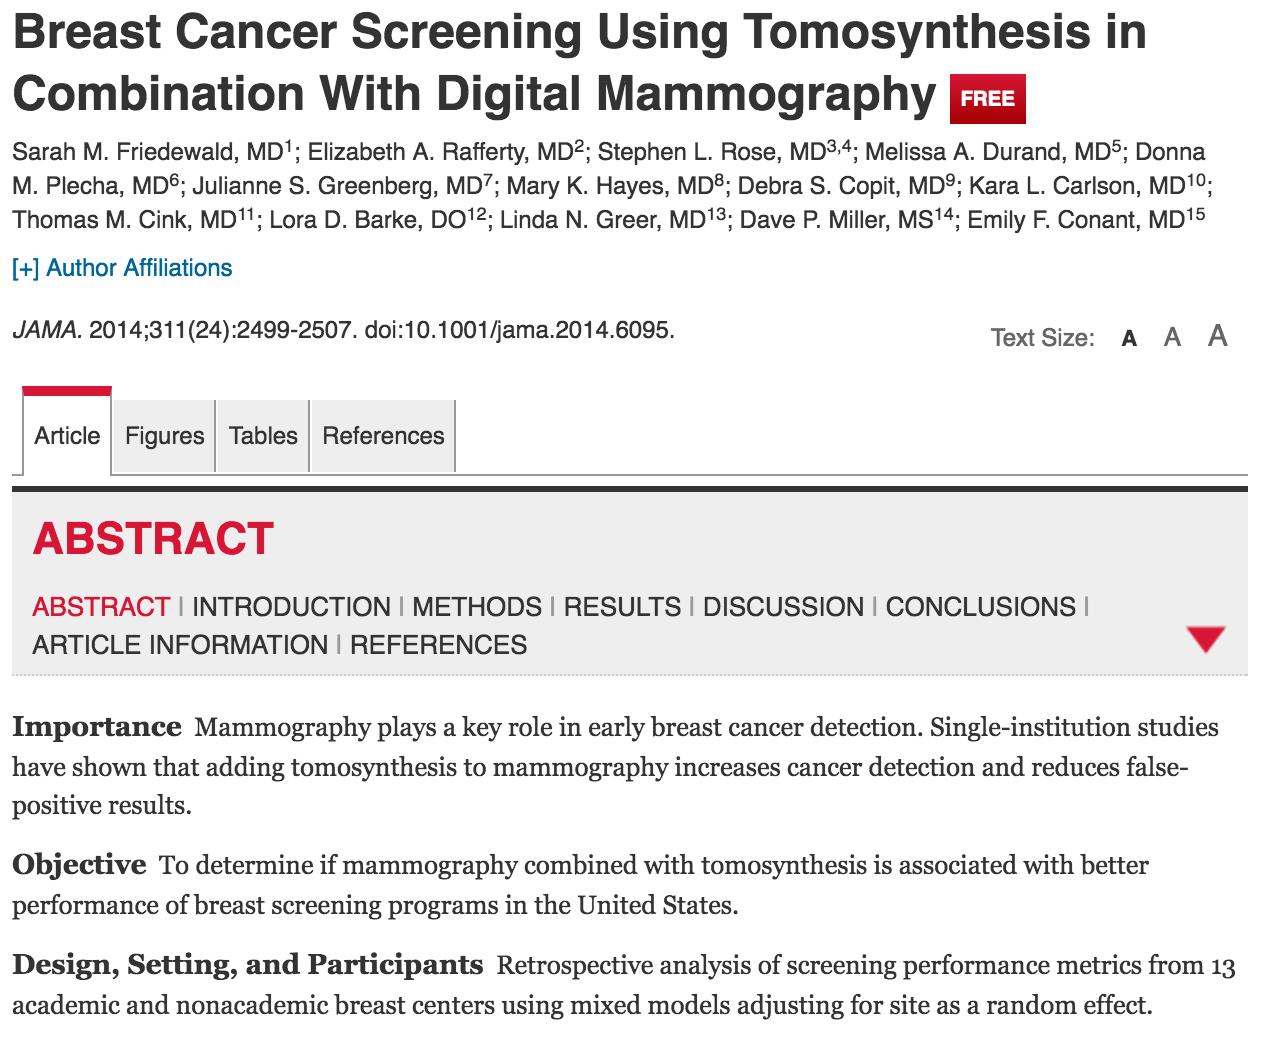 Benefits of Tomosynthesis